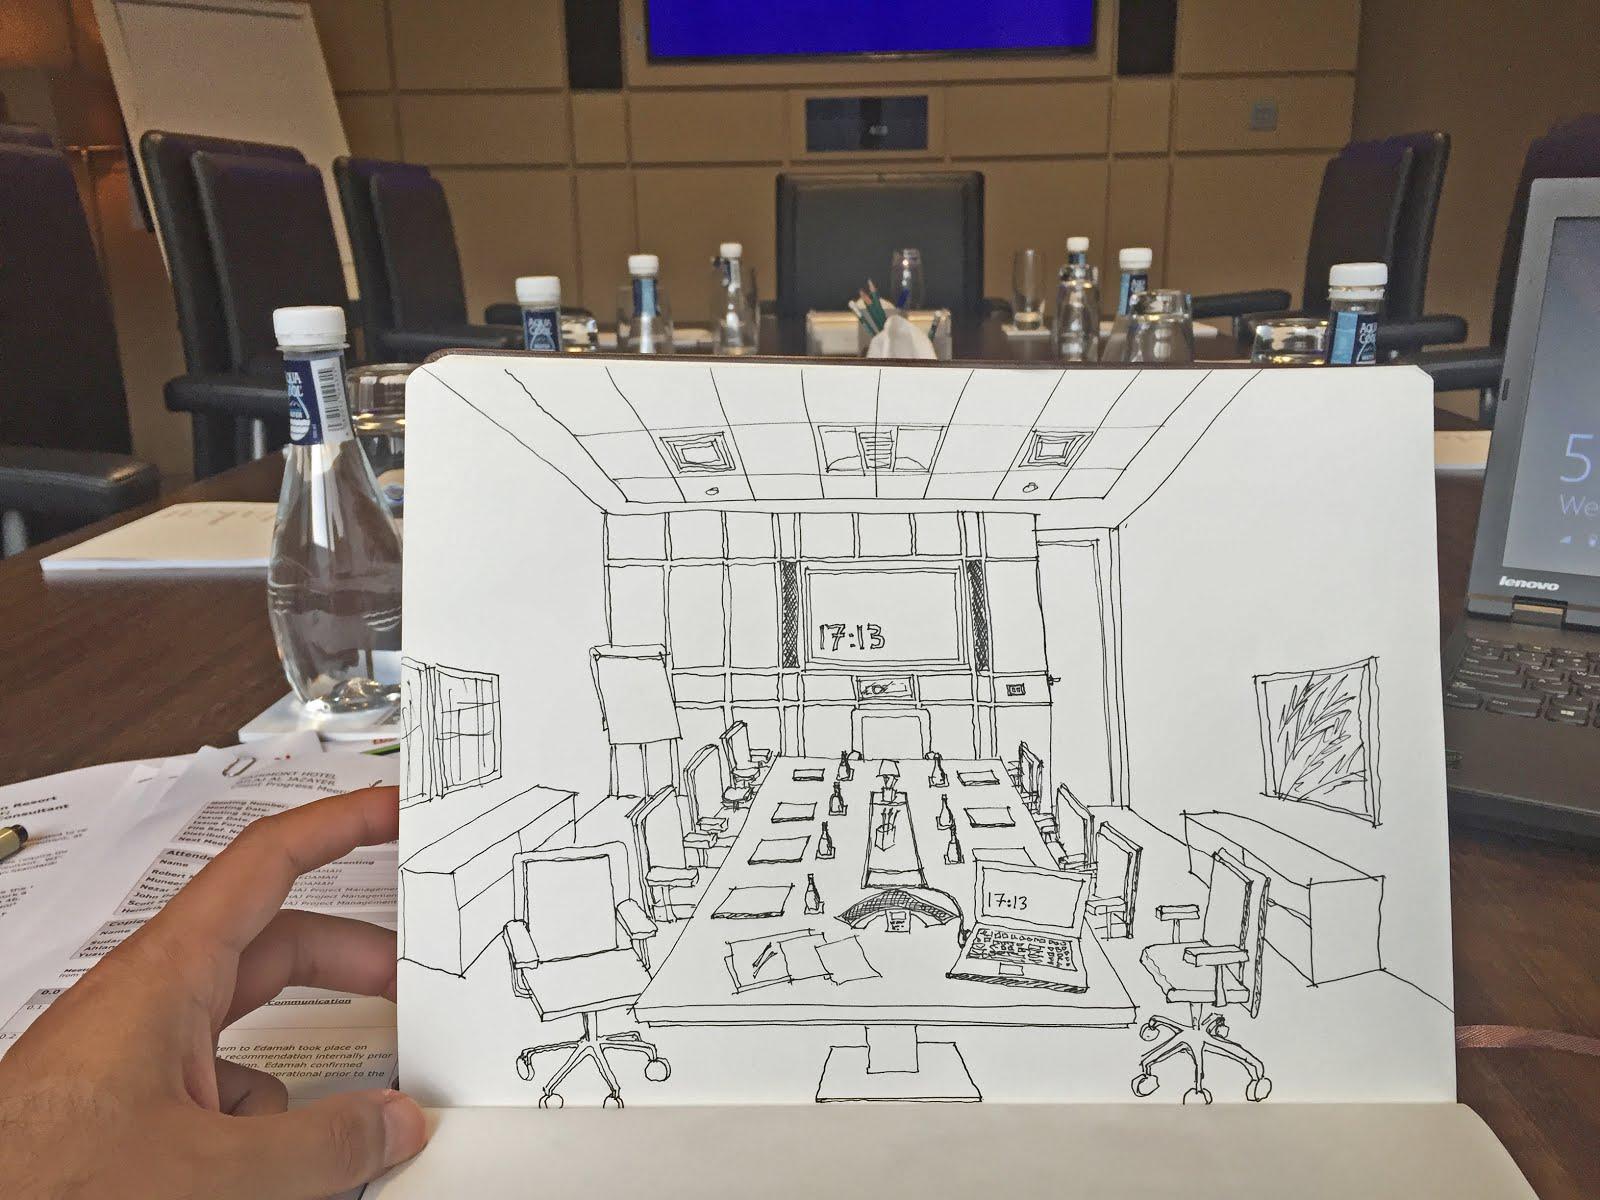 & a personal online sketchbook: Desk/Workspace Sketch